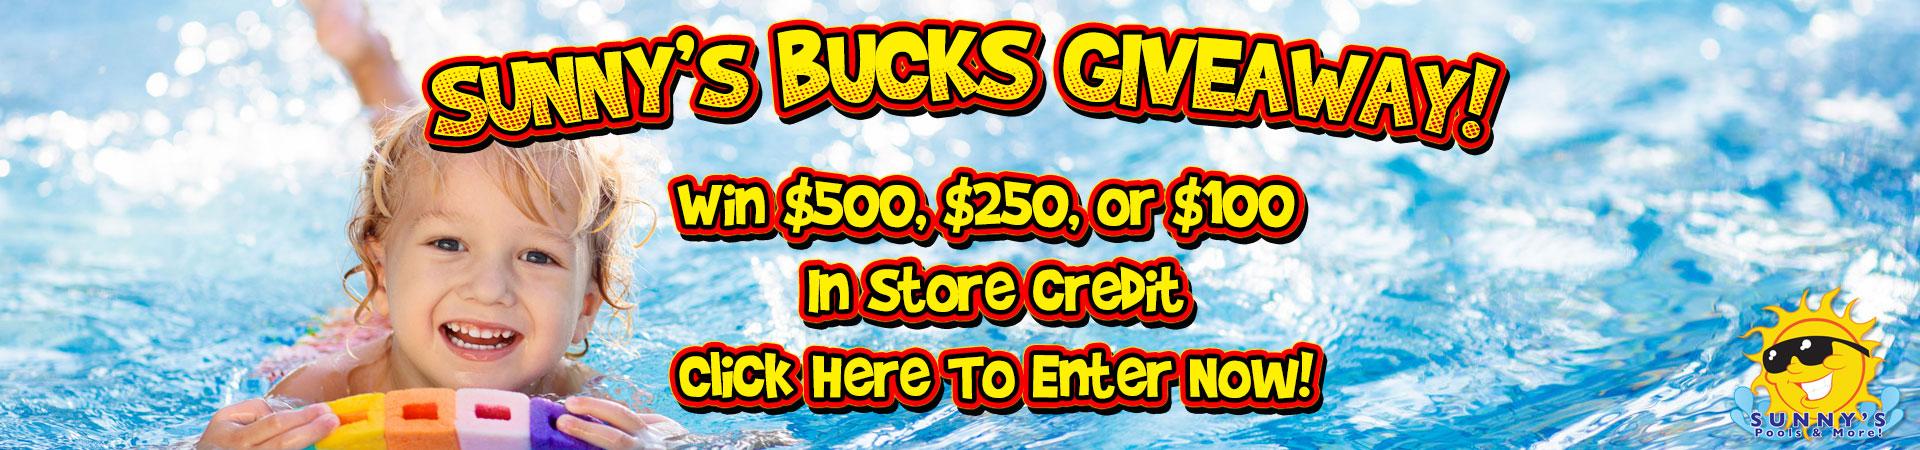 Sunny's Bucks Giveaway